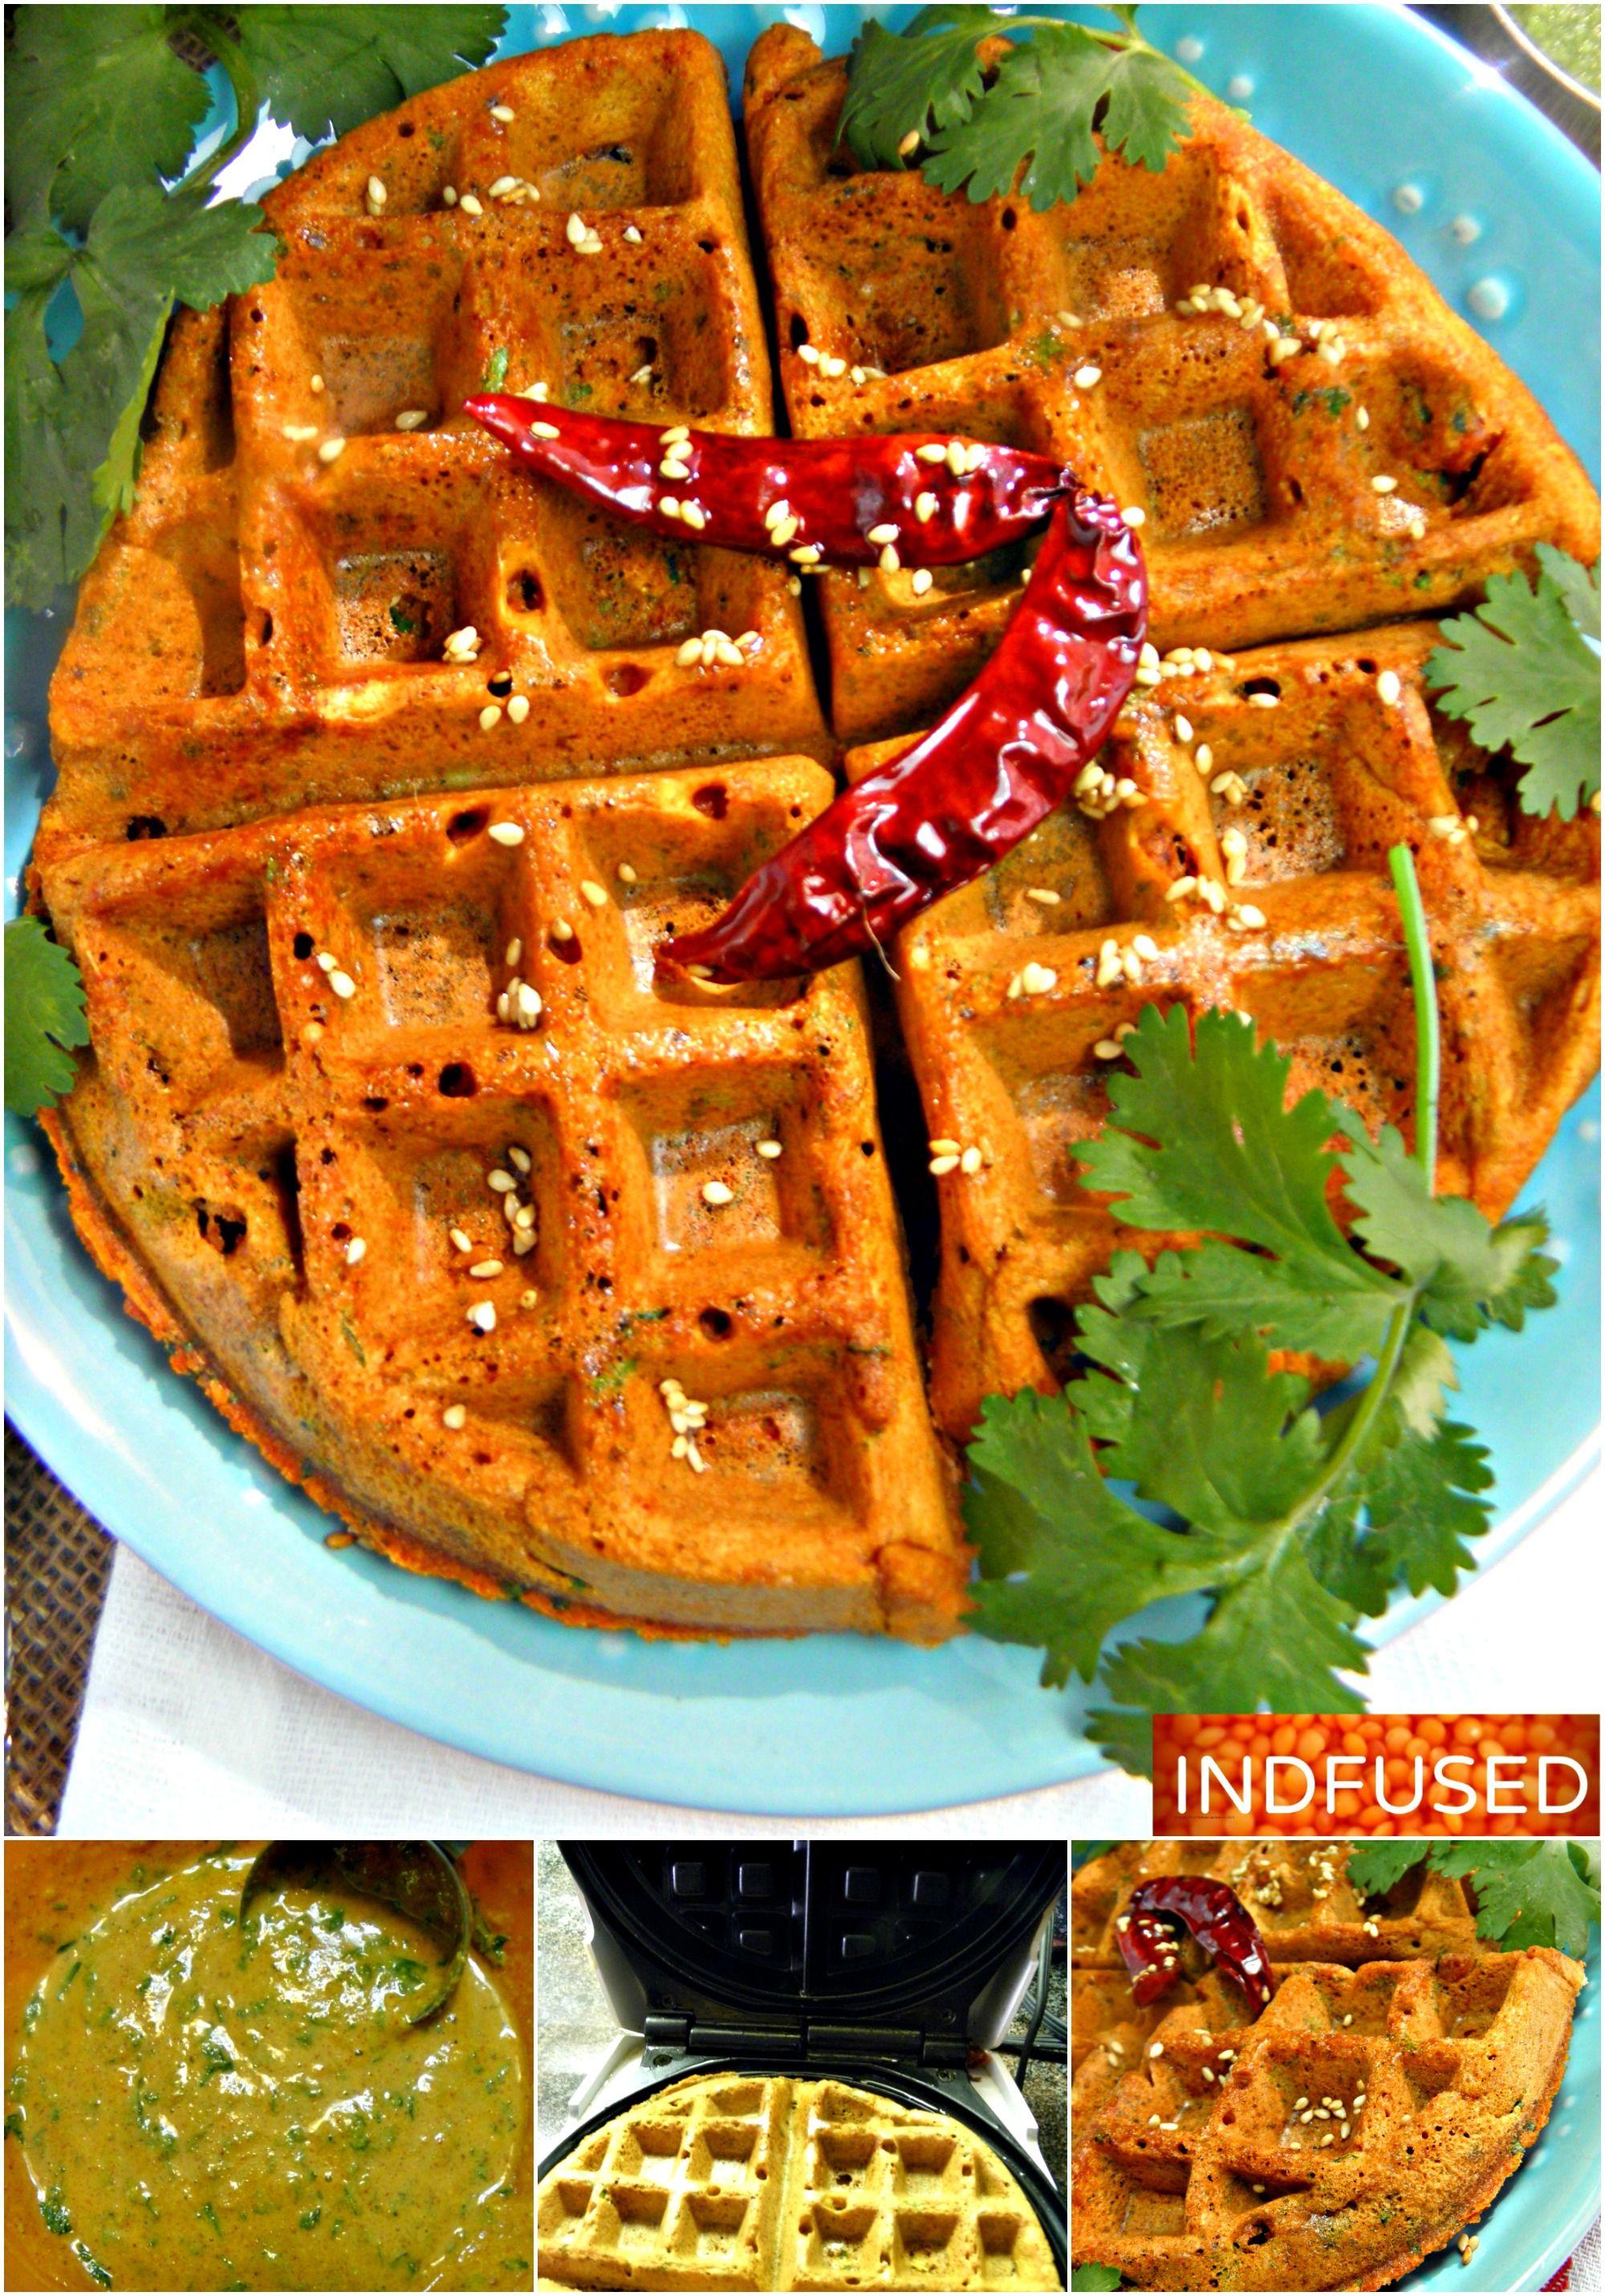 Wordpress Com In 2020 Indian Food Recipes Recipes Waffles